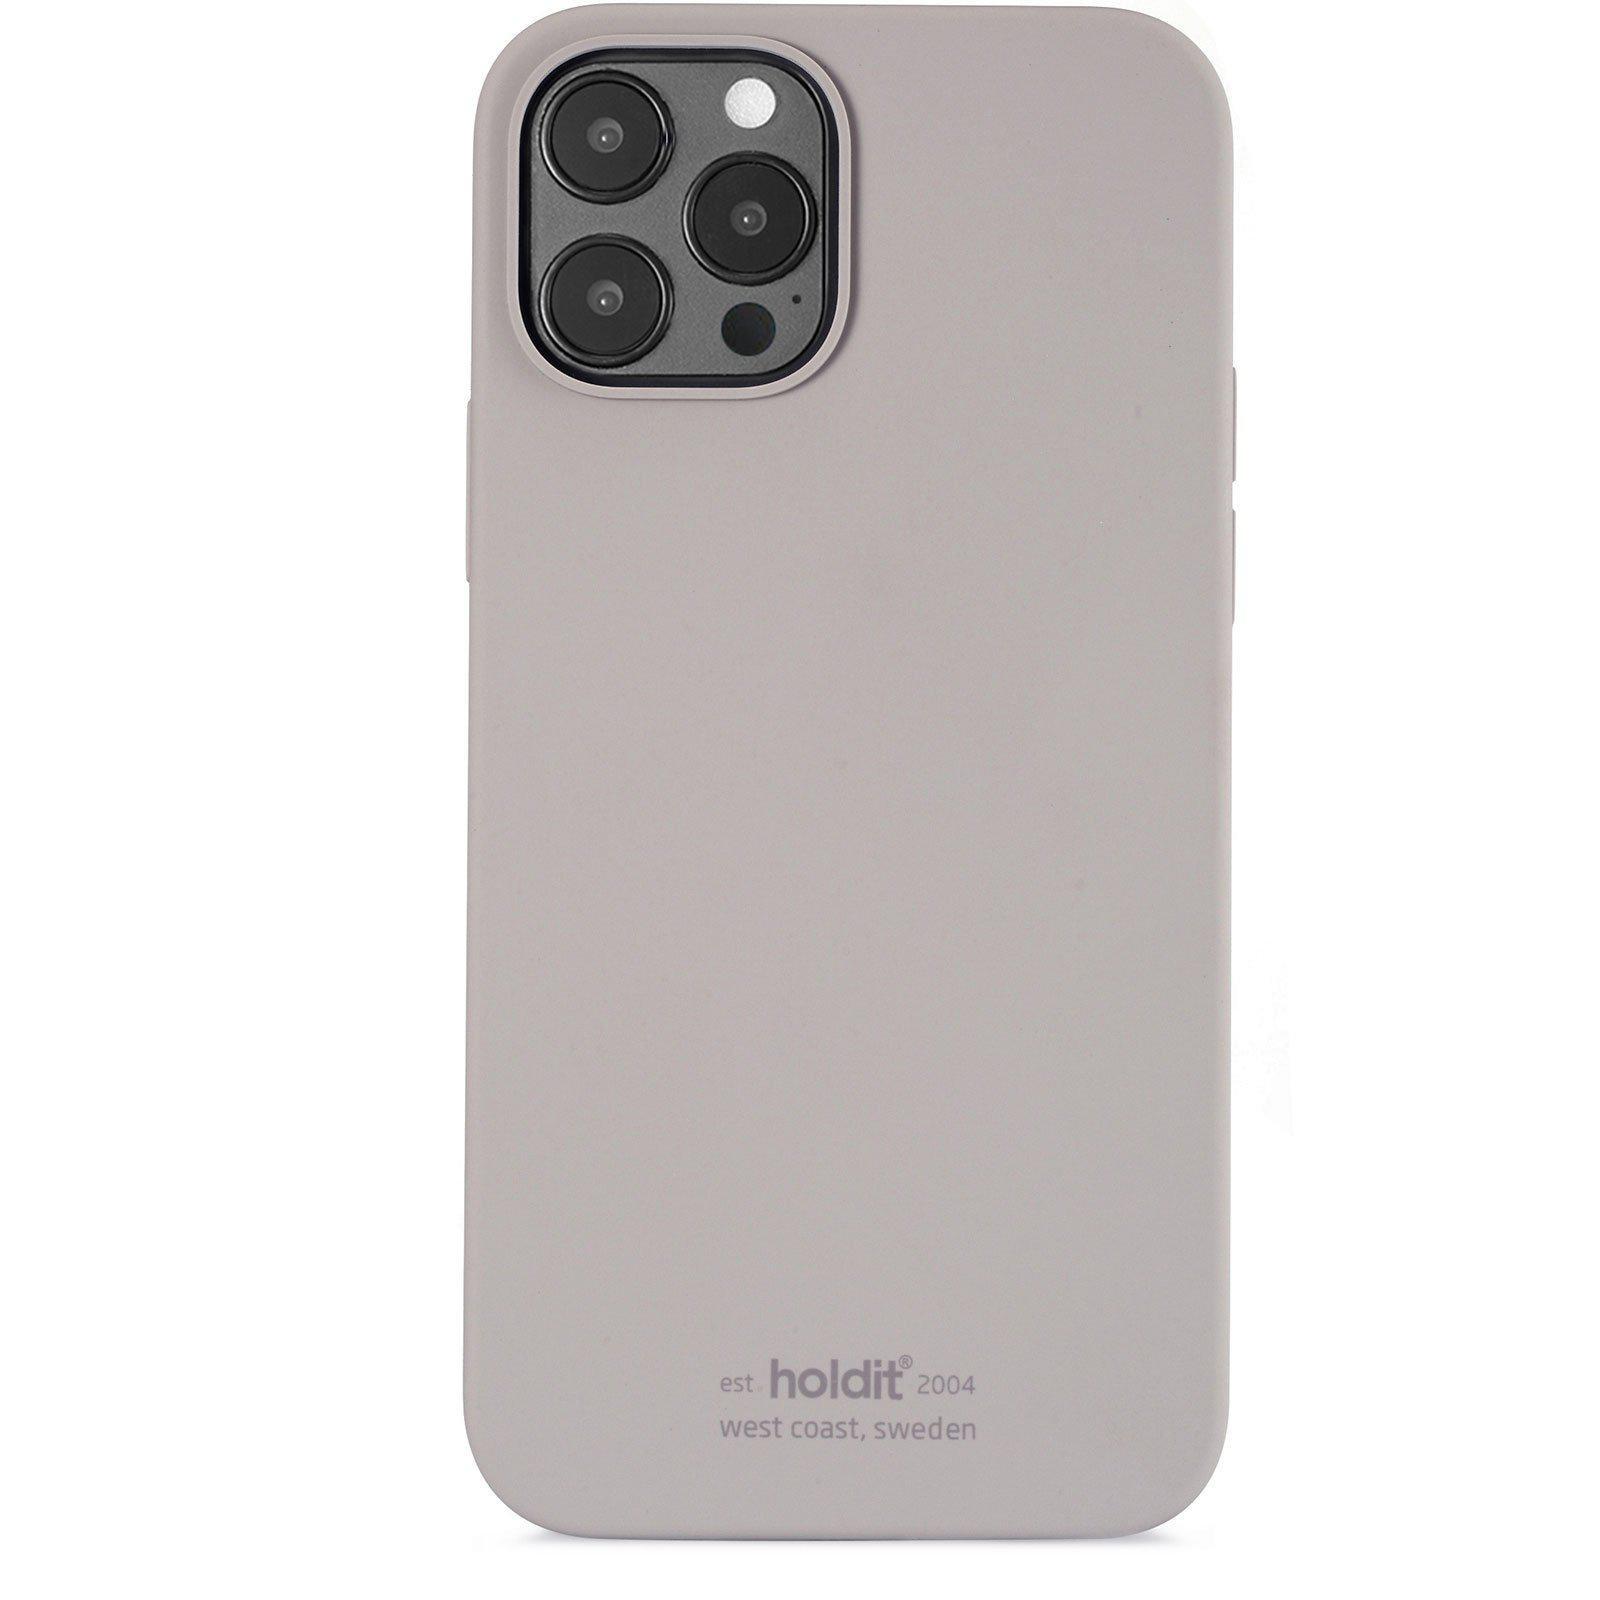 Silikonskal iPhone 12 Pro Max Taupe